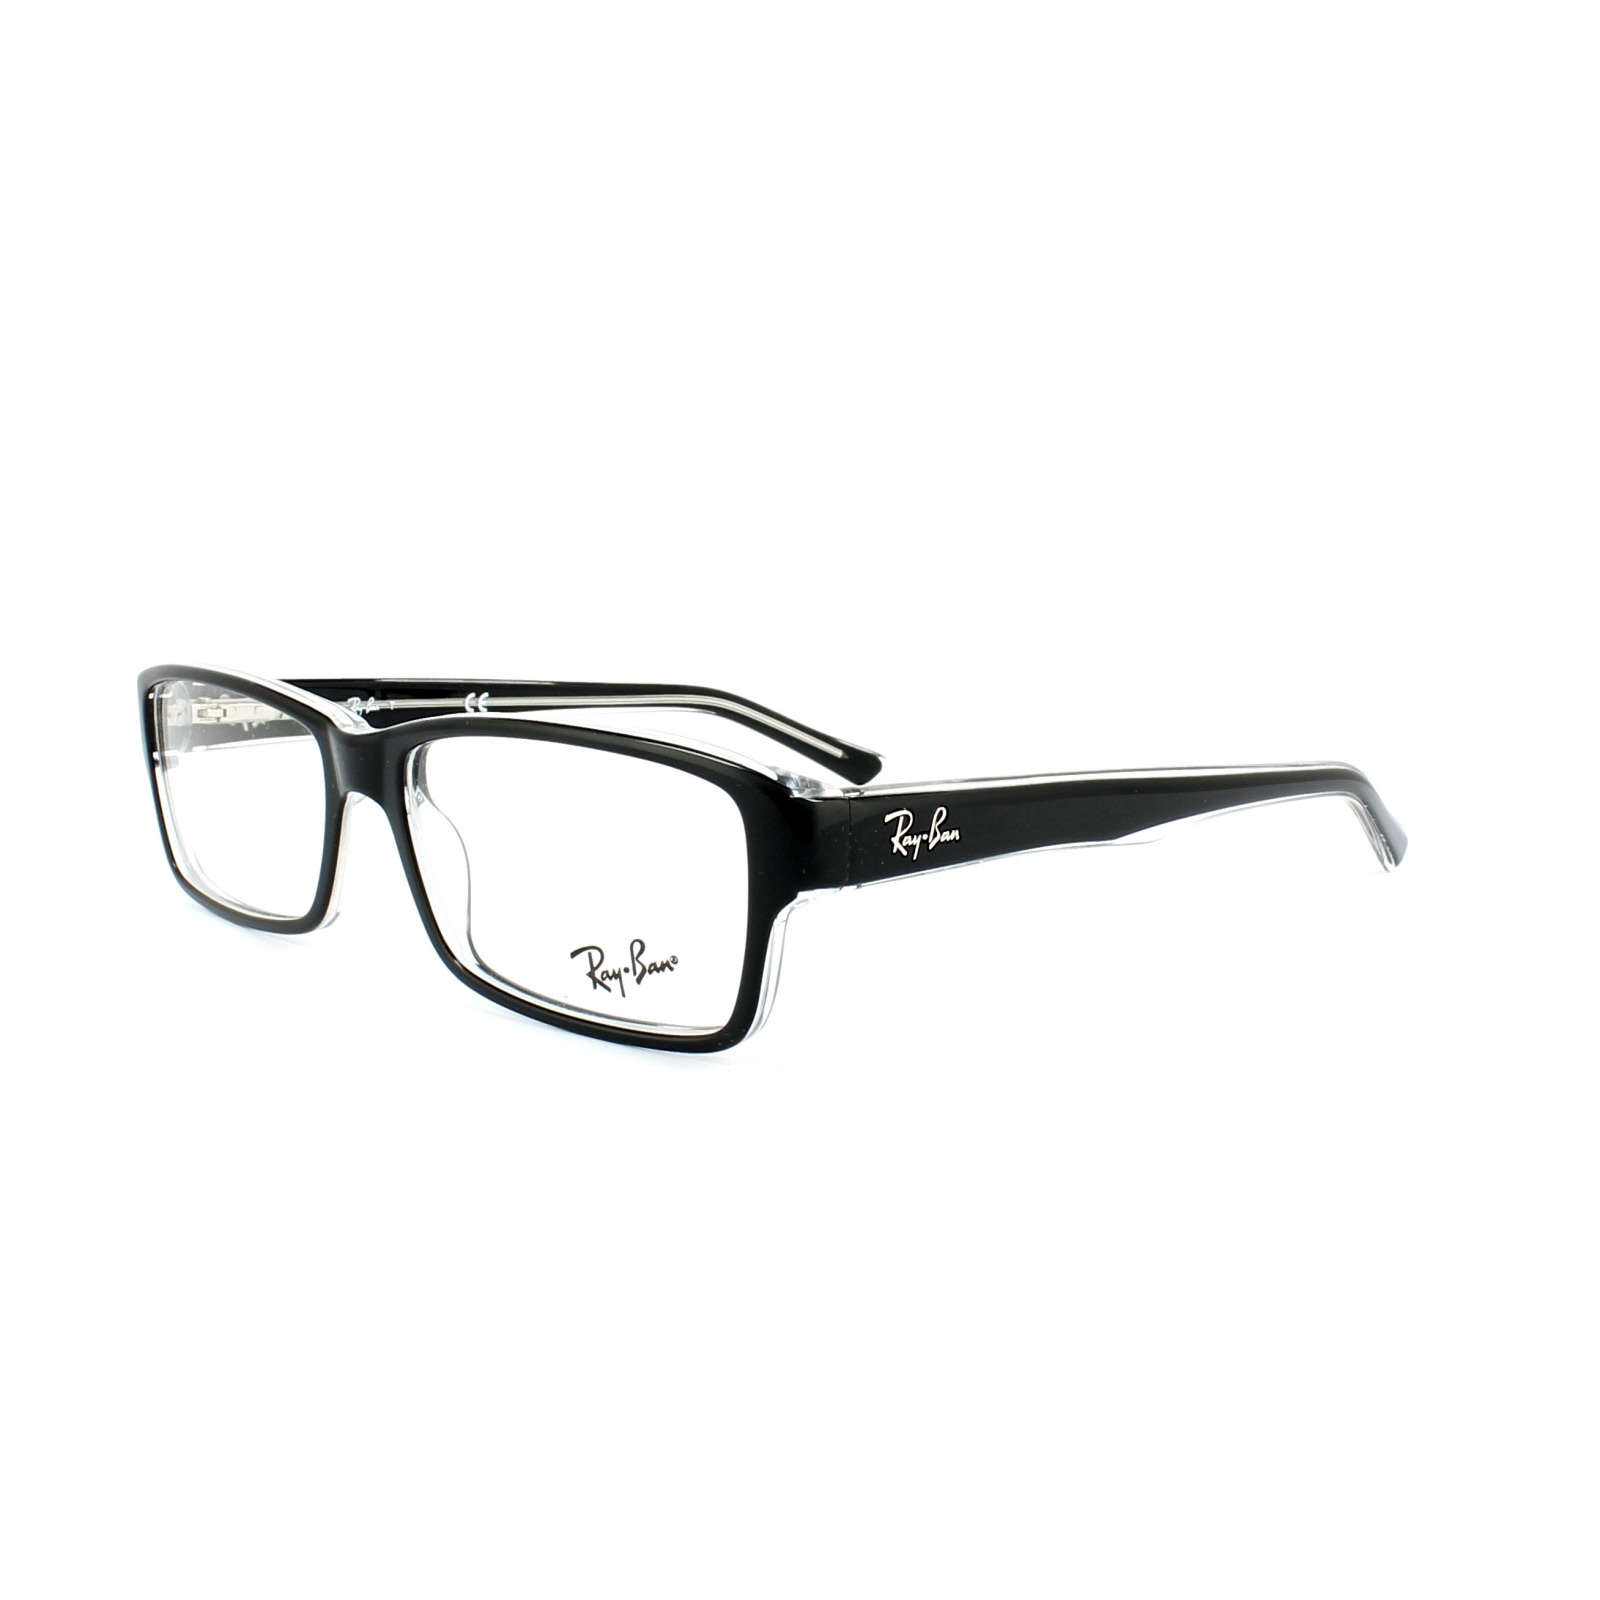 ray ban brillengestell 5169 2034 top black on transparent 54mm. Black Bedroom Furniture Sets. Home Design Ideas